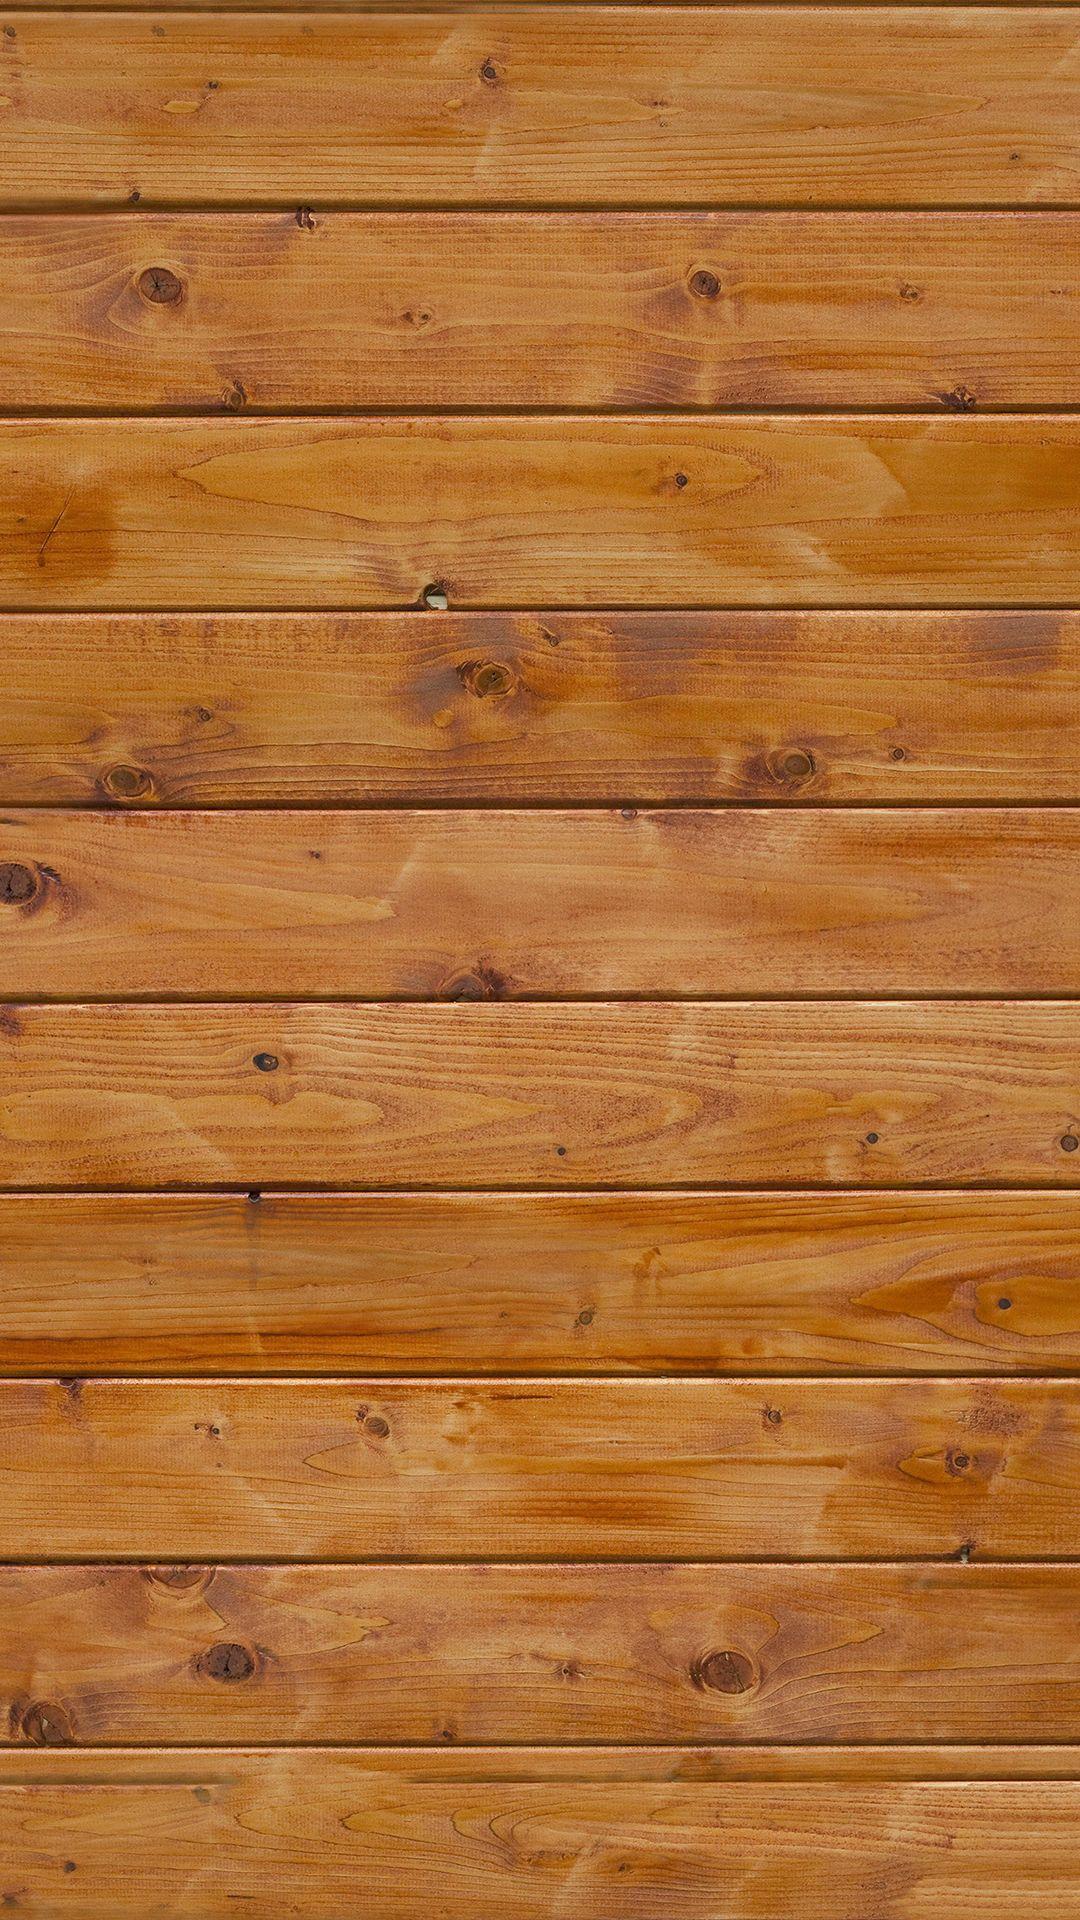 Wood Plank Texture Pattern IPhone 6 Plus Wallpaper